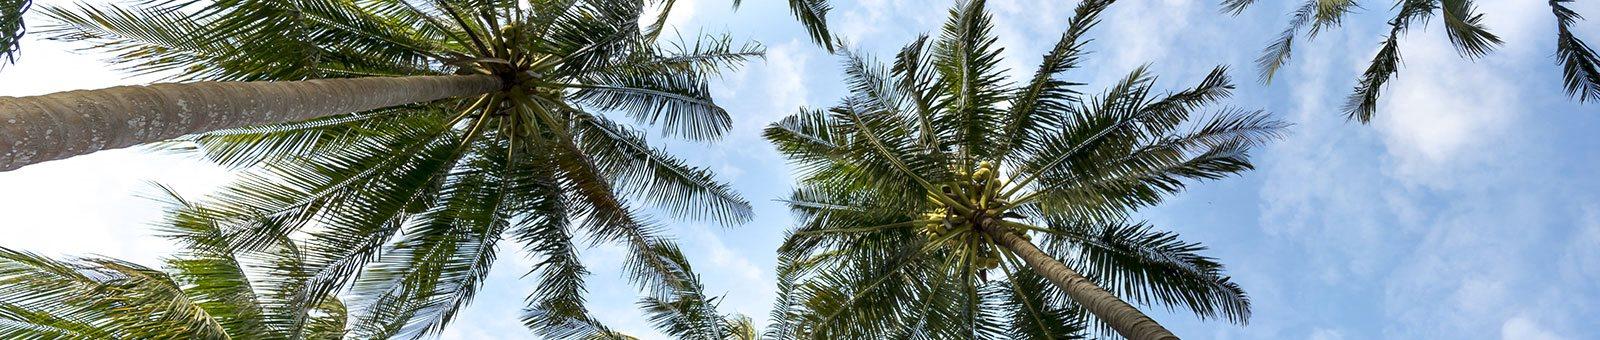 Palm trees_Cypress Oaks Apartments Leesburg, FL